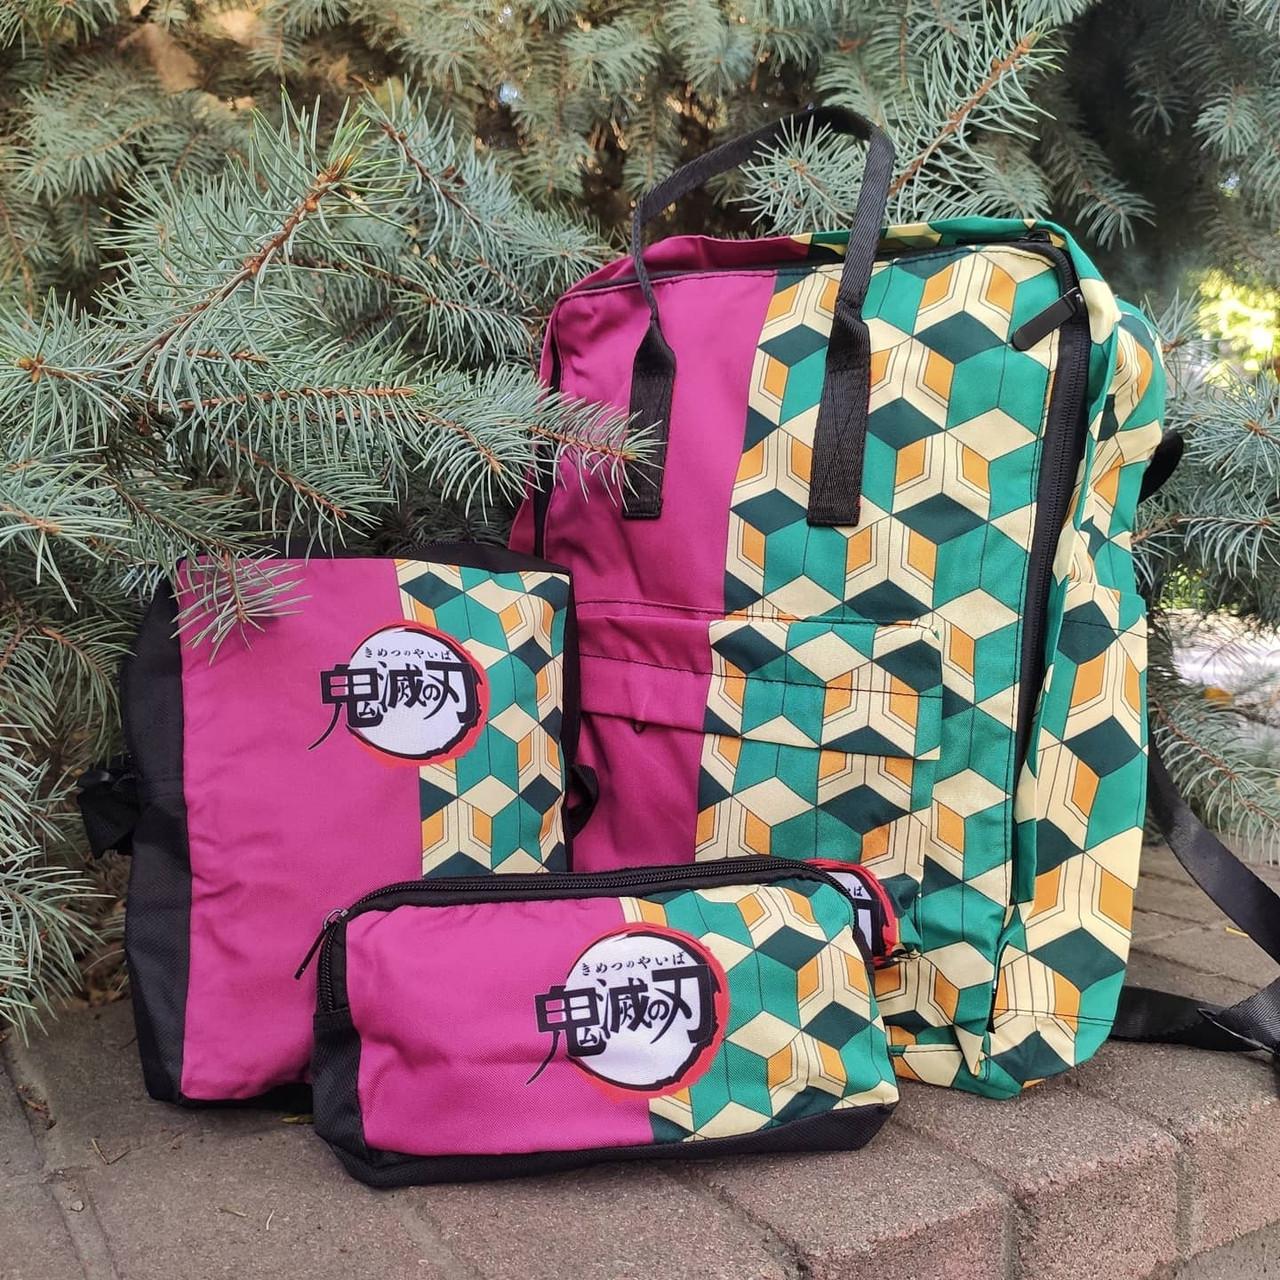 Набор рюкзак, сумочка, пенал Томиока - Клинок рассекающий демонов